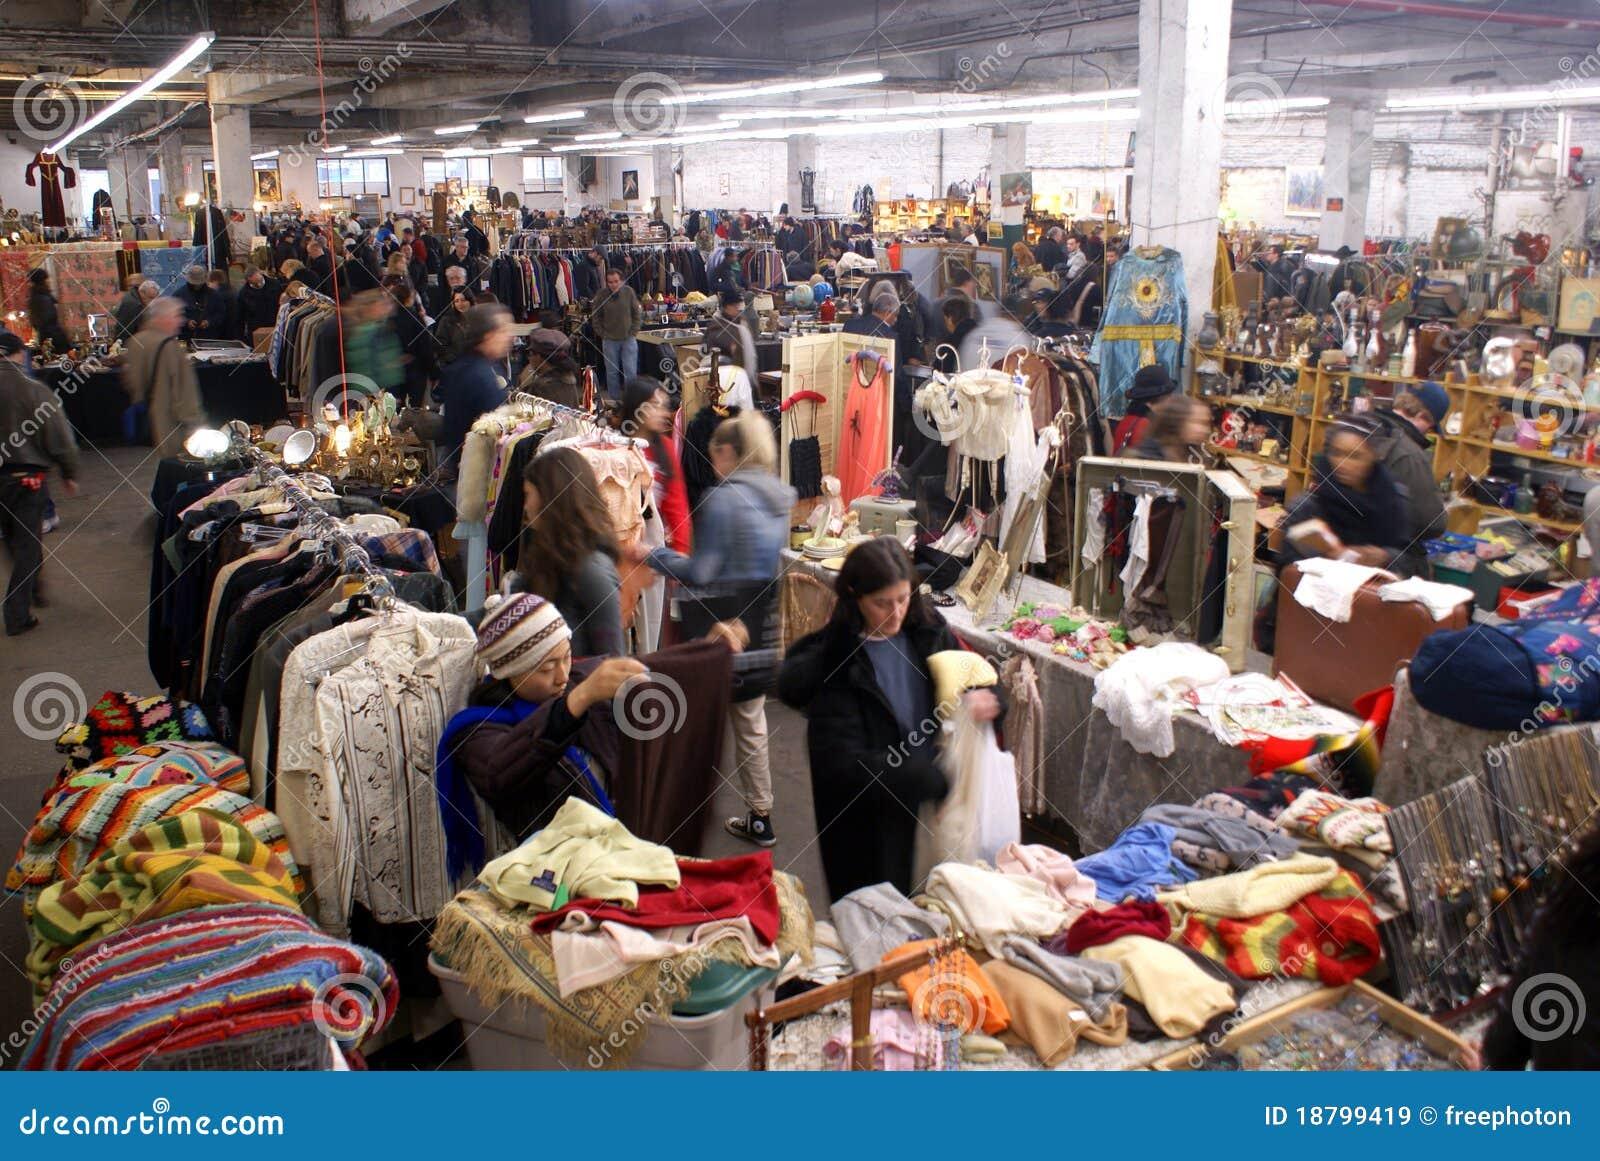 Antiques Garage Flea Market In New York City Editorial